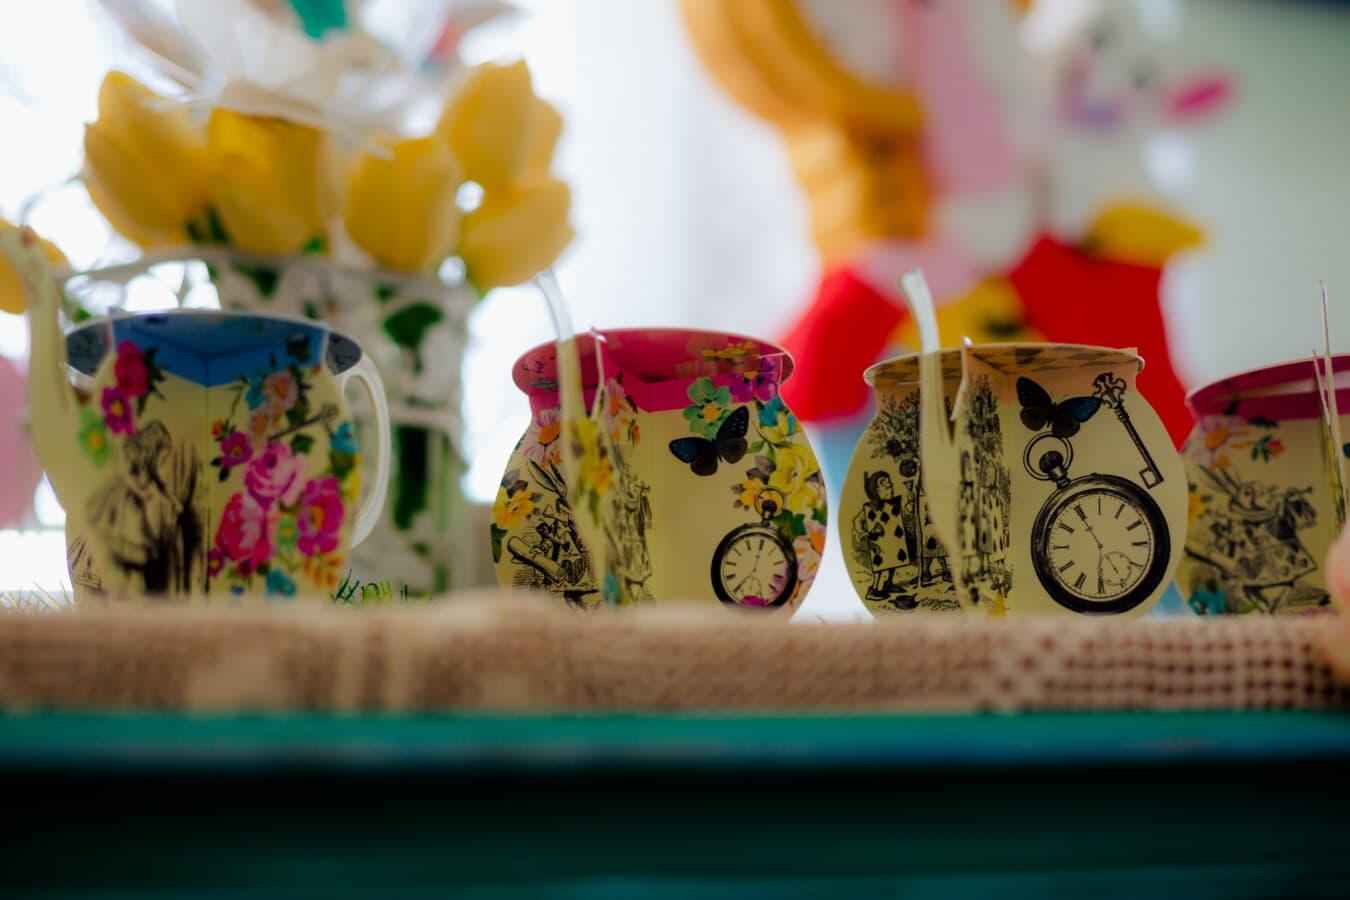 carton, teapot, object, handmade, craft, miniature, cup, still life, color, table